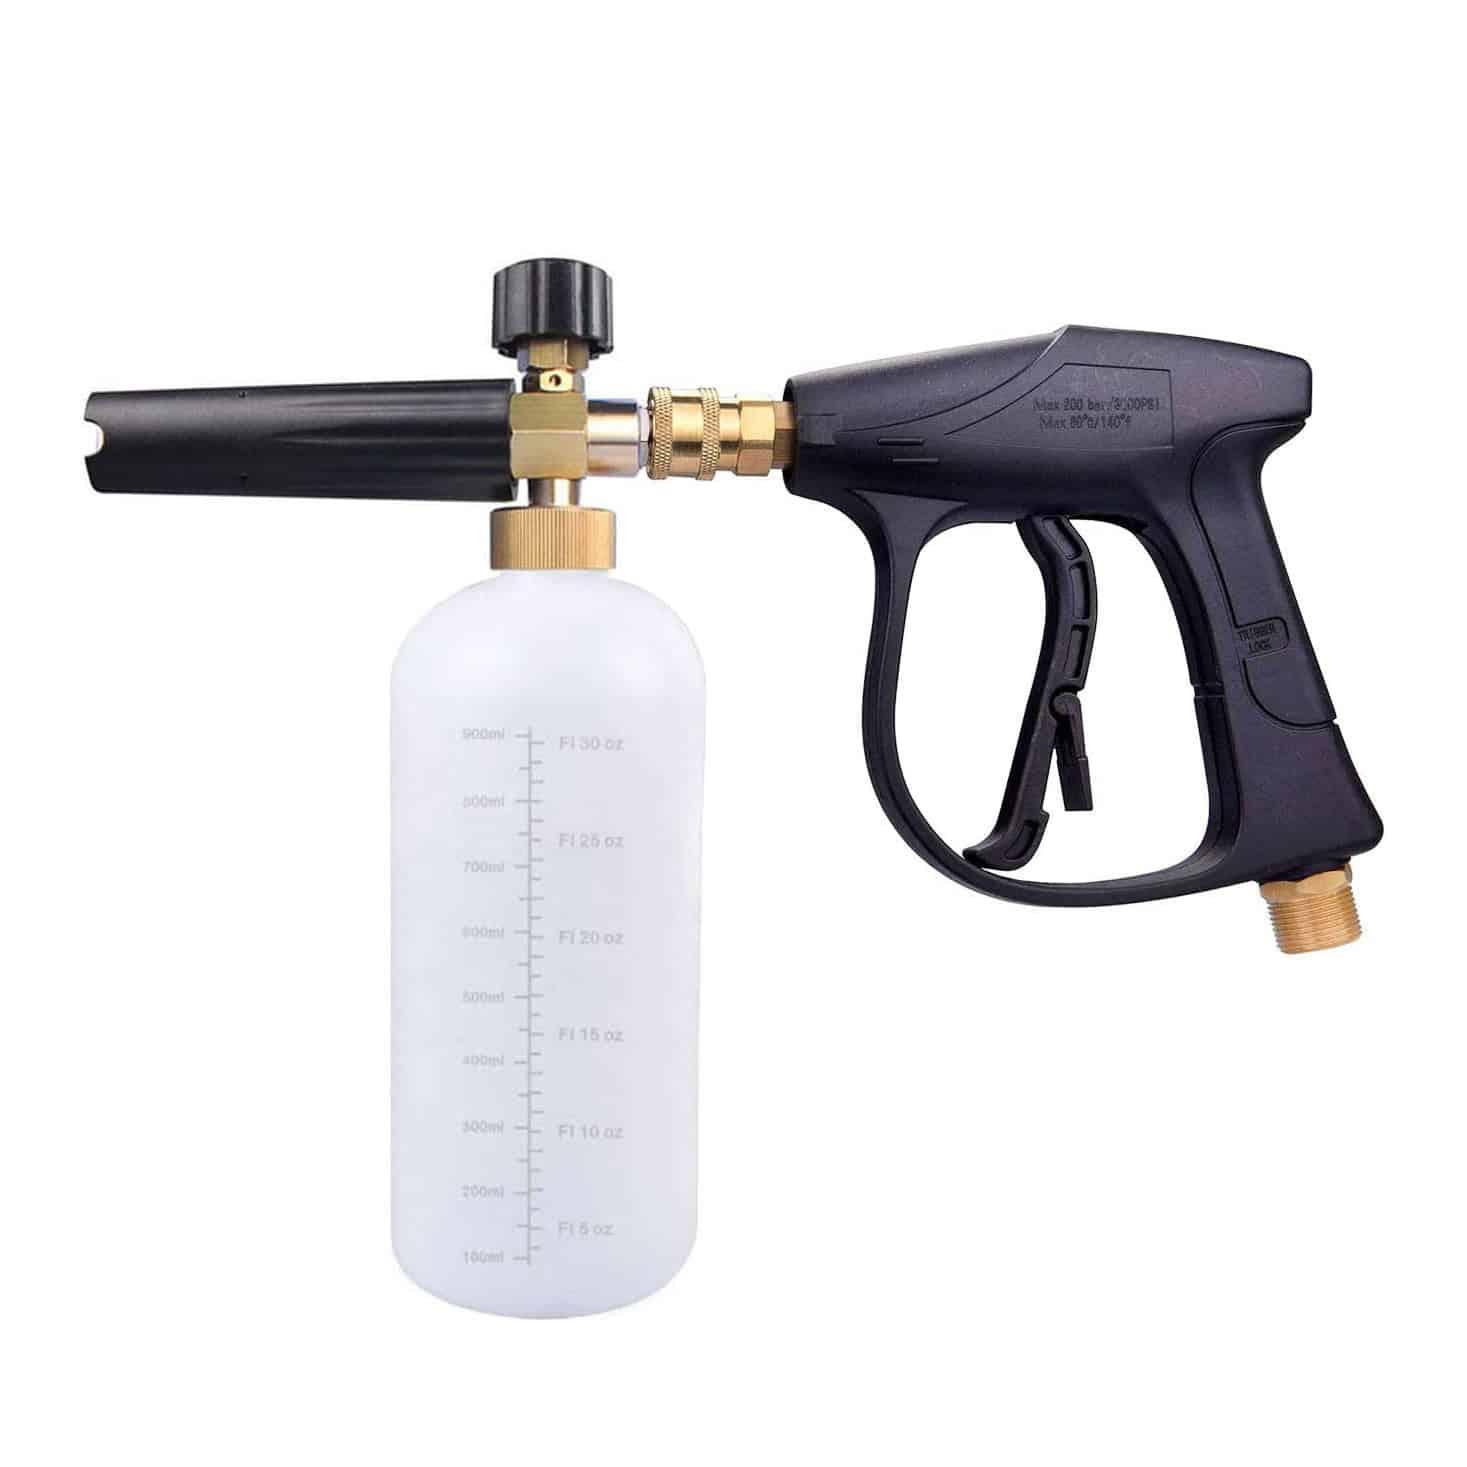 JWGJW Foam Cannon - High Pressure Cleaning Gun